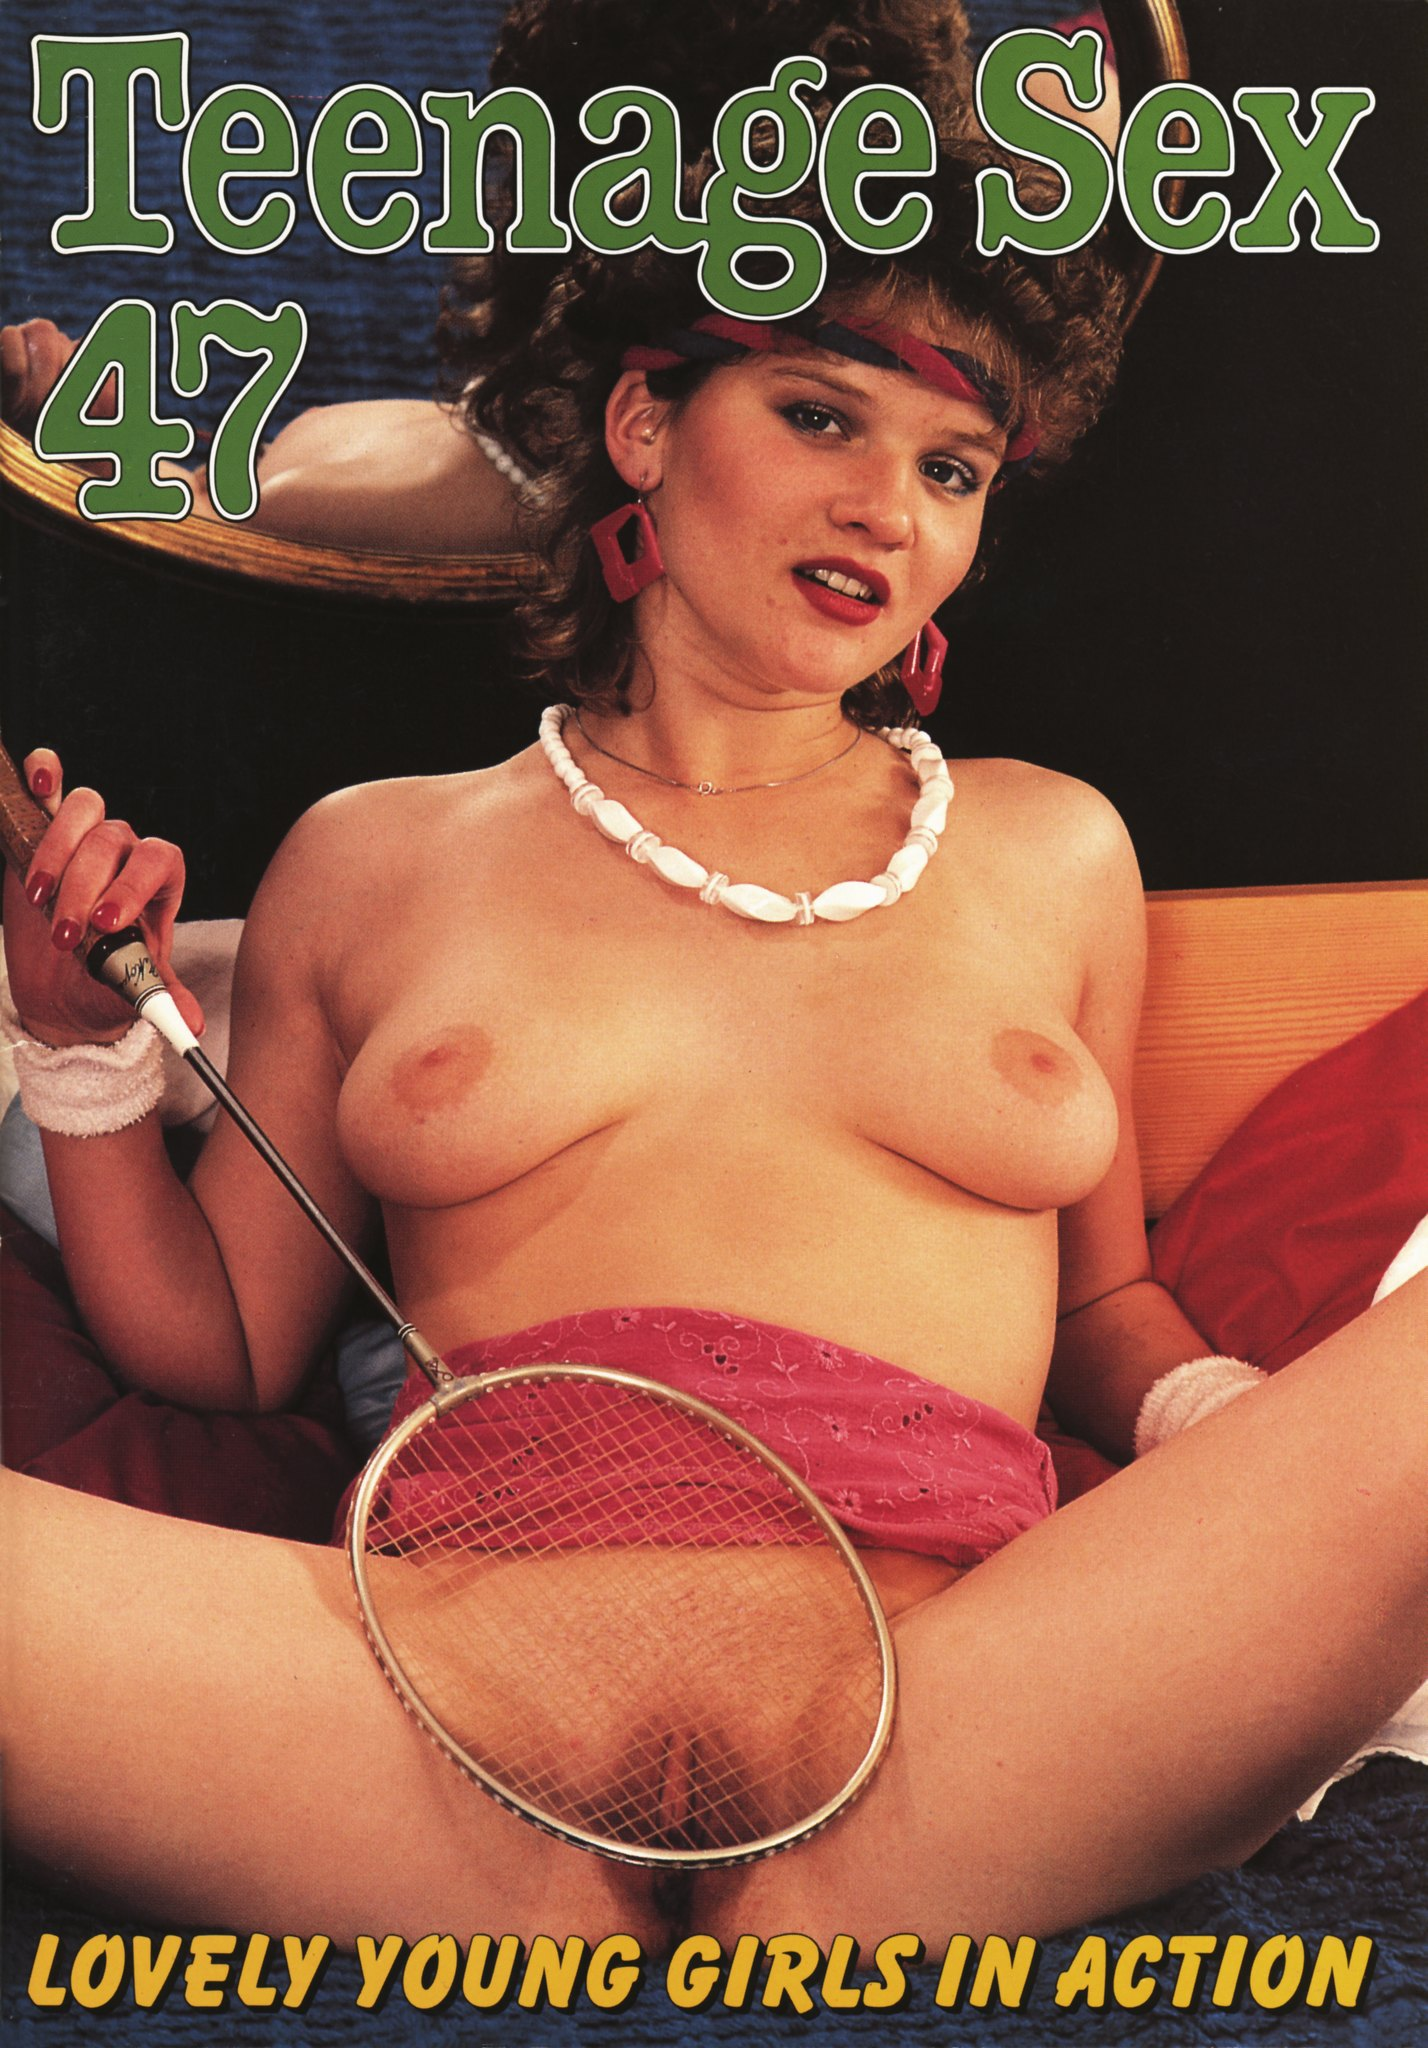 182350669_teenage_sex_47_1987_01_front.jpg